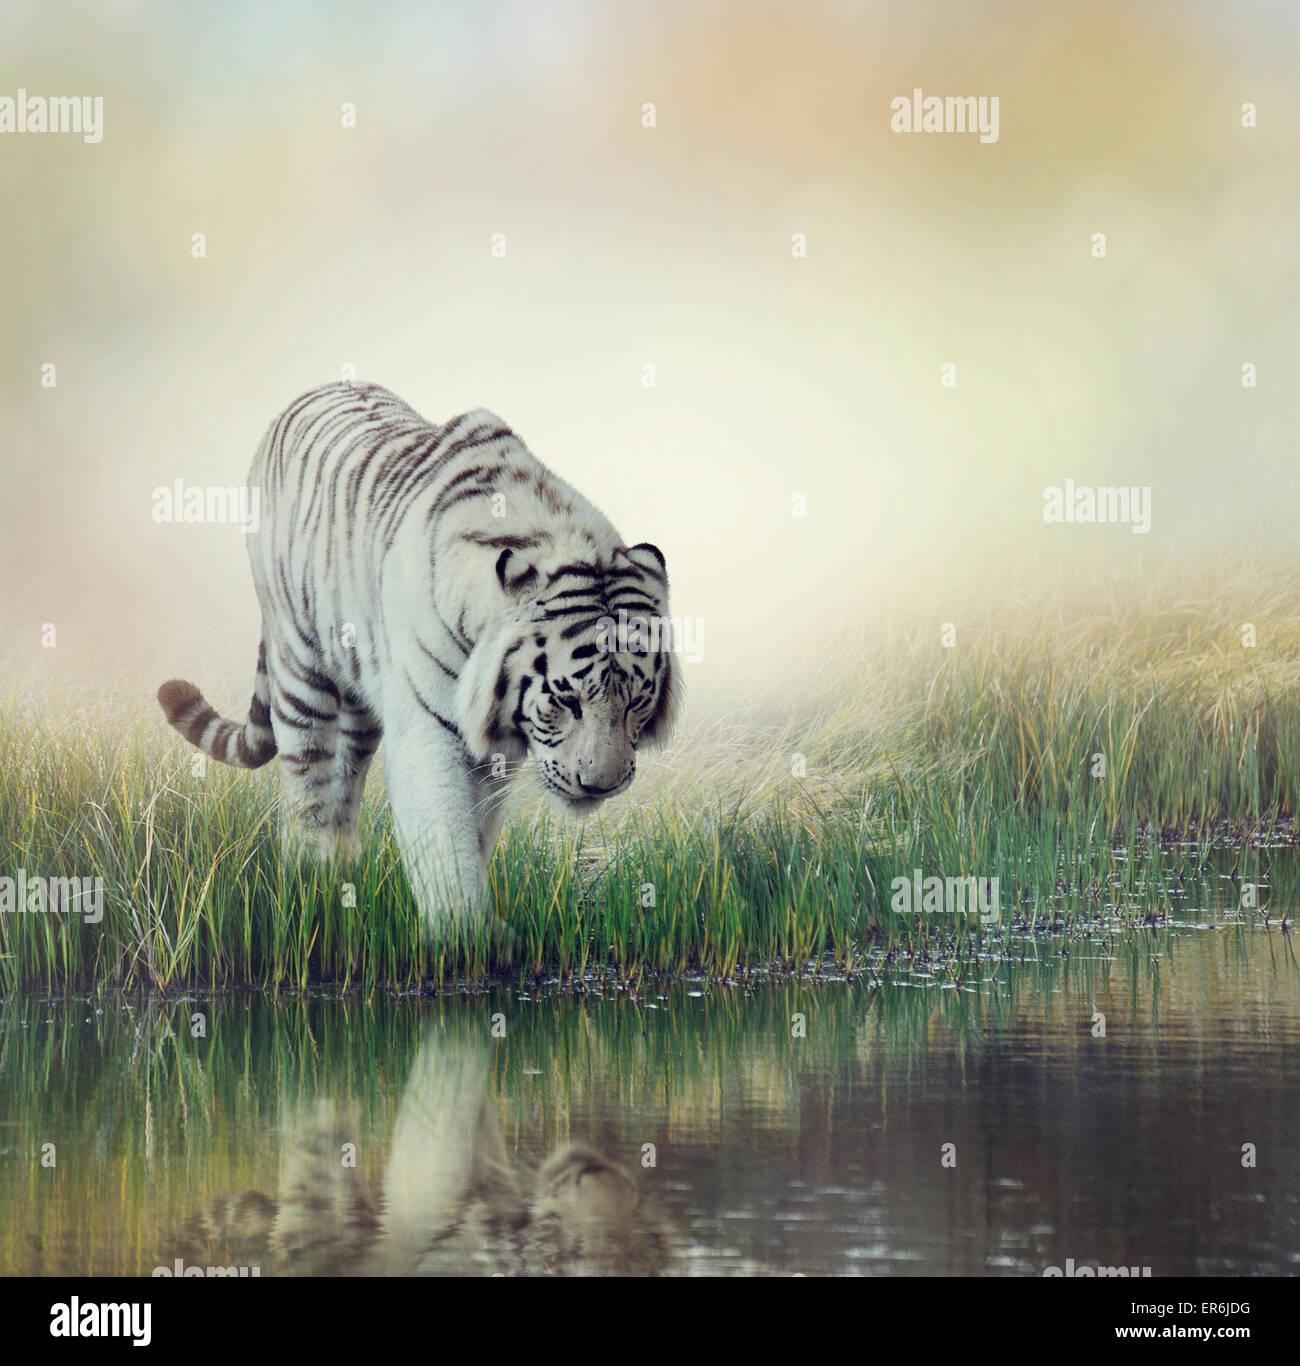 White Tiger Near A Pond - Stock Image